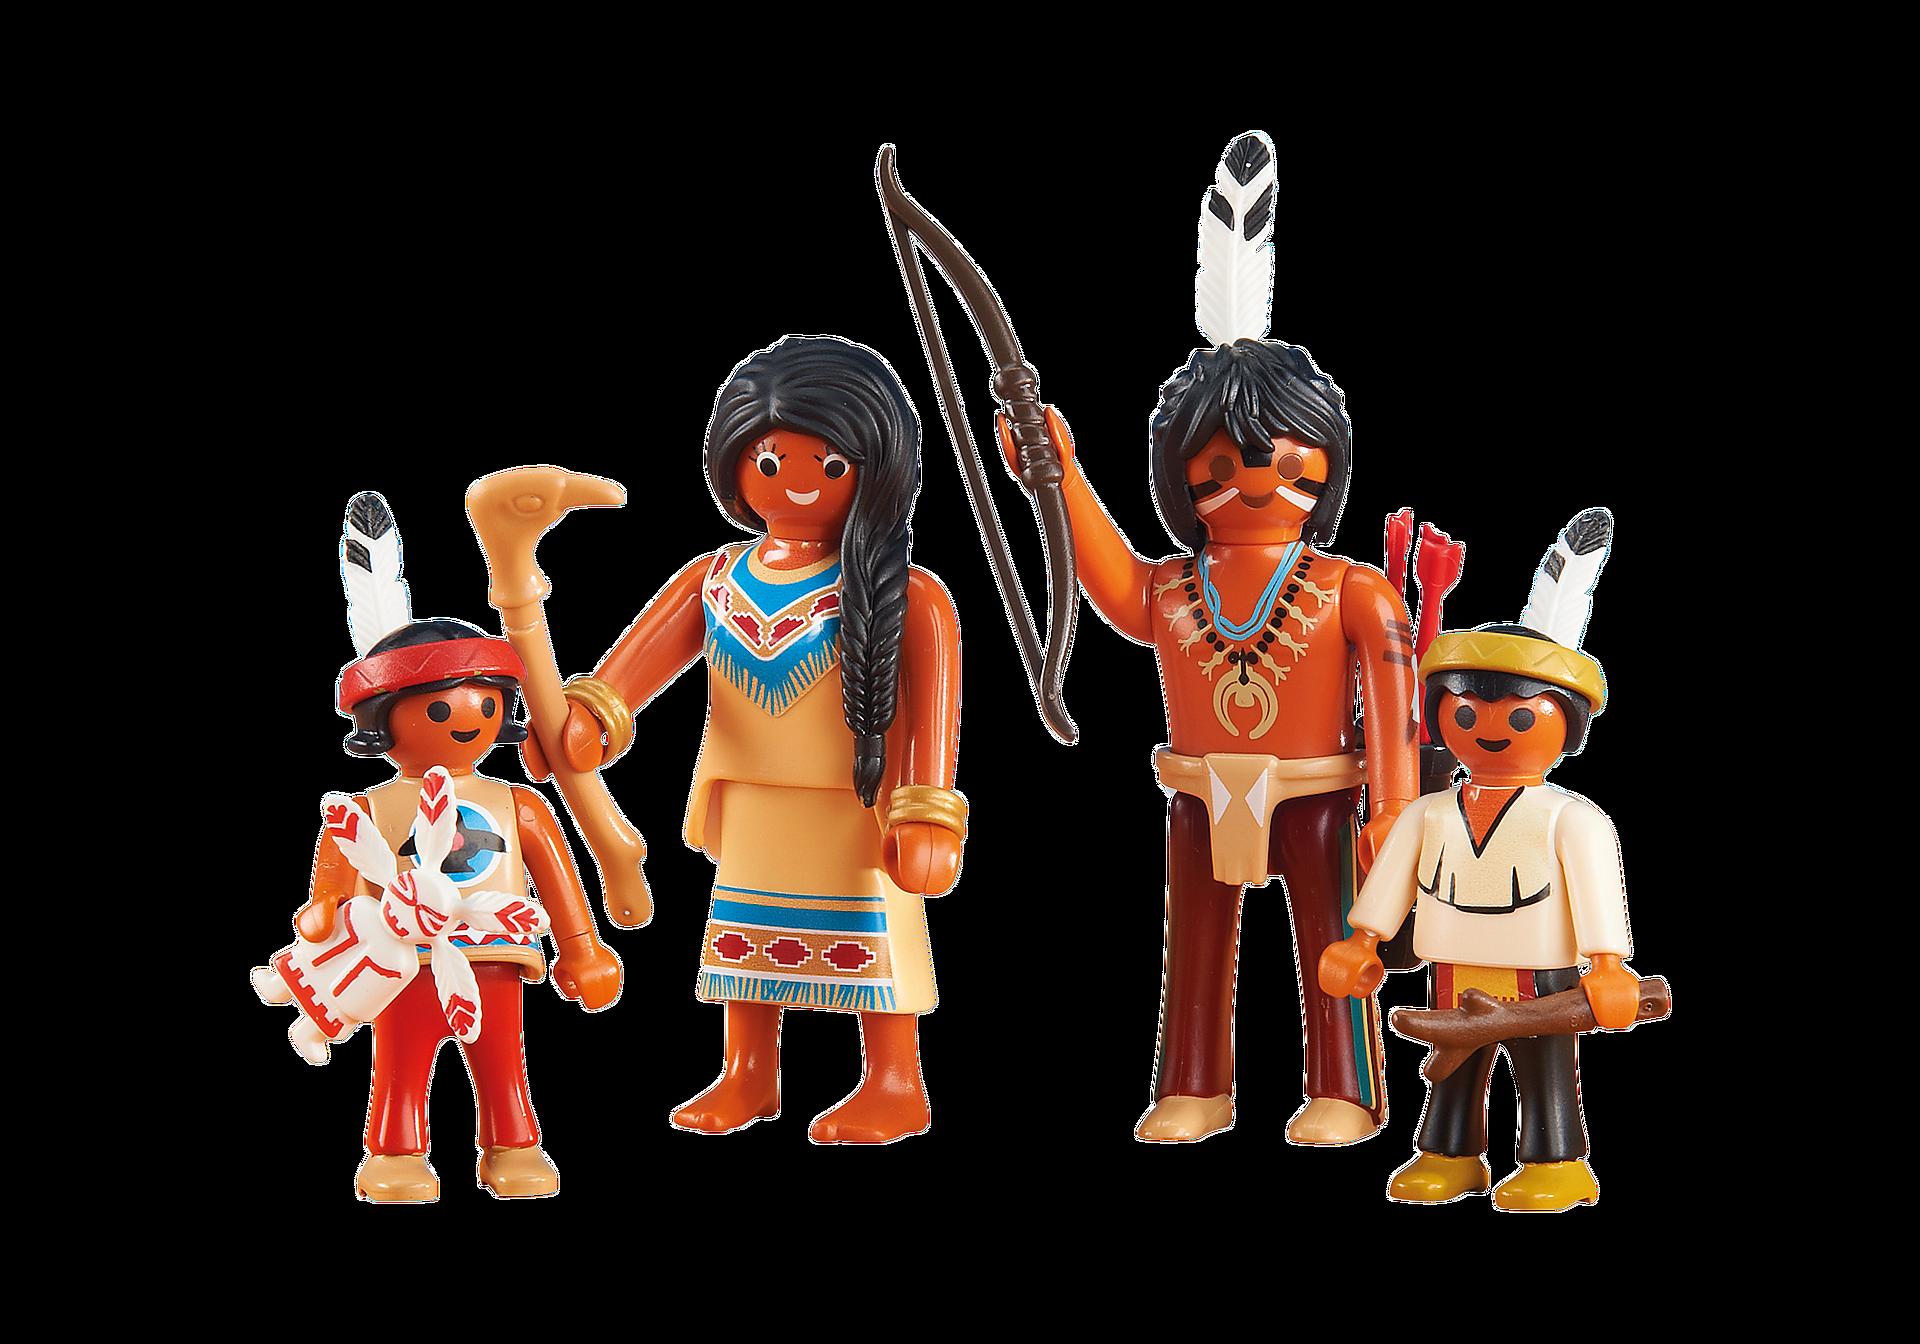 6322 Família de Índios zoom image1